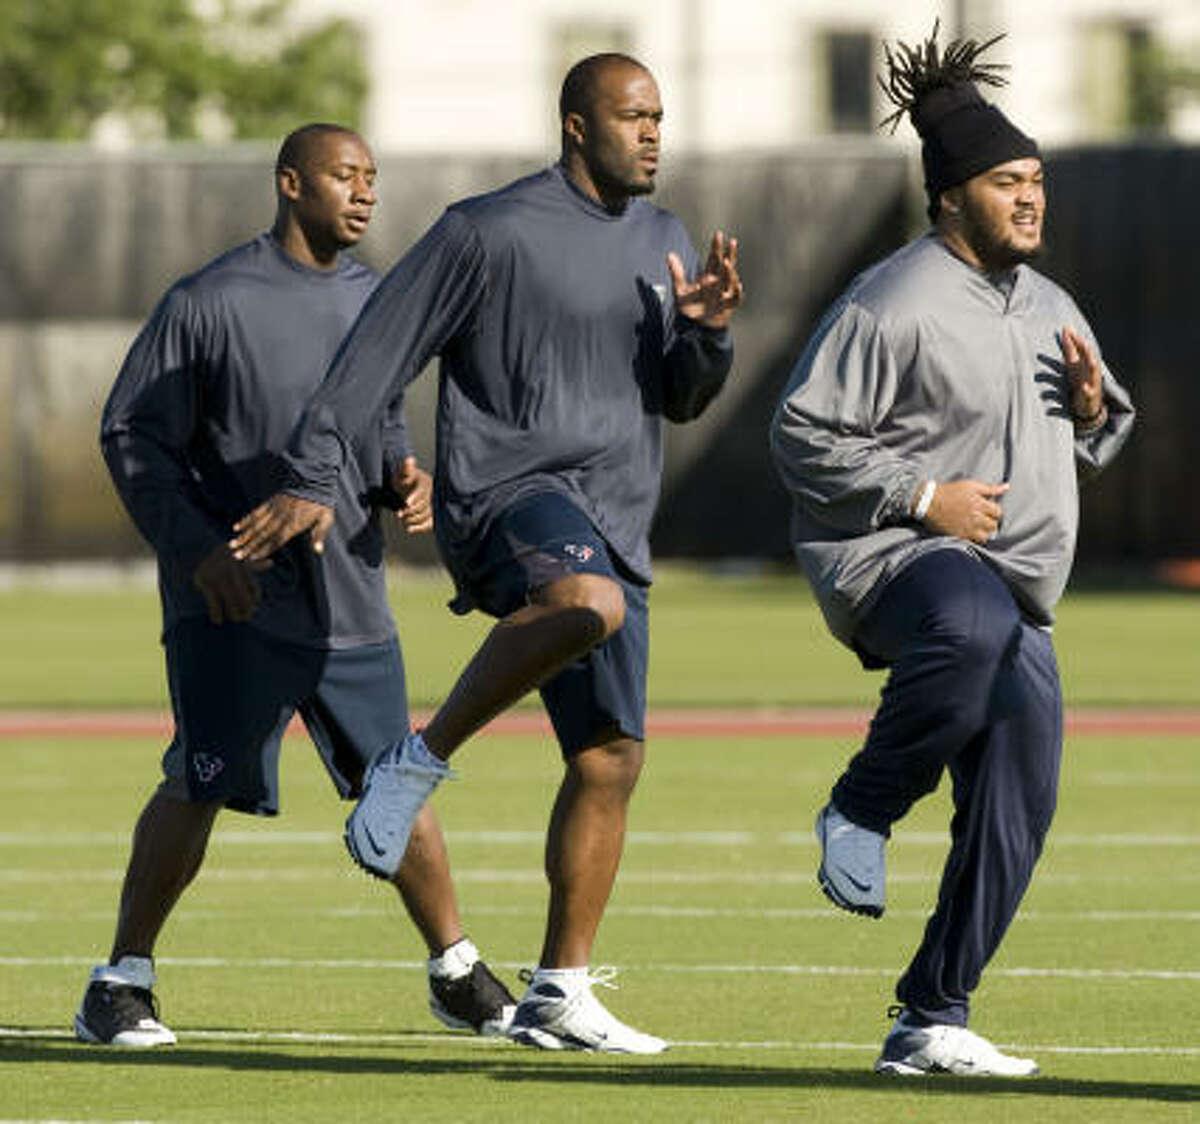 Texans defensive end Mario Williams, center, led the team with 12 sacks last season.